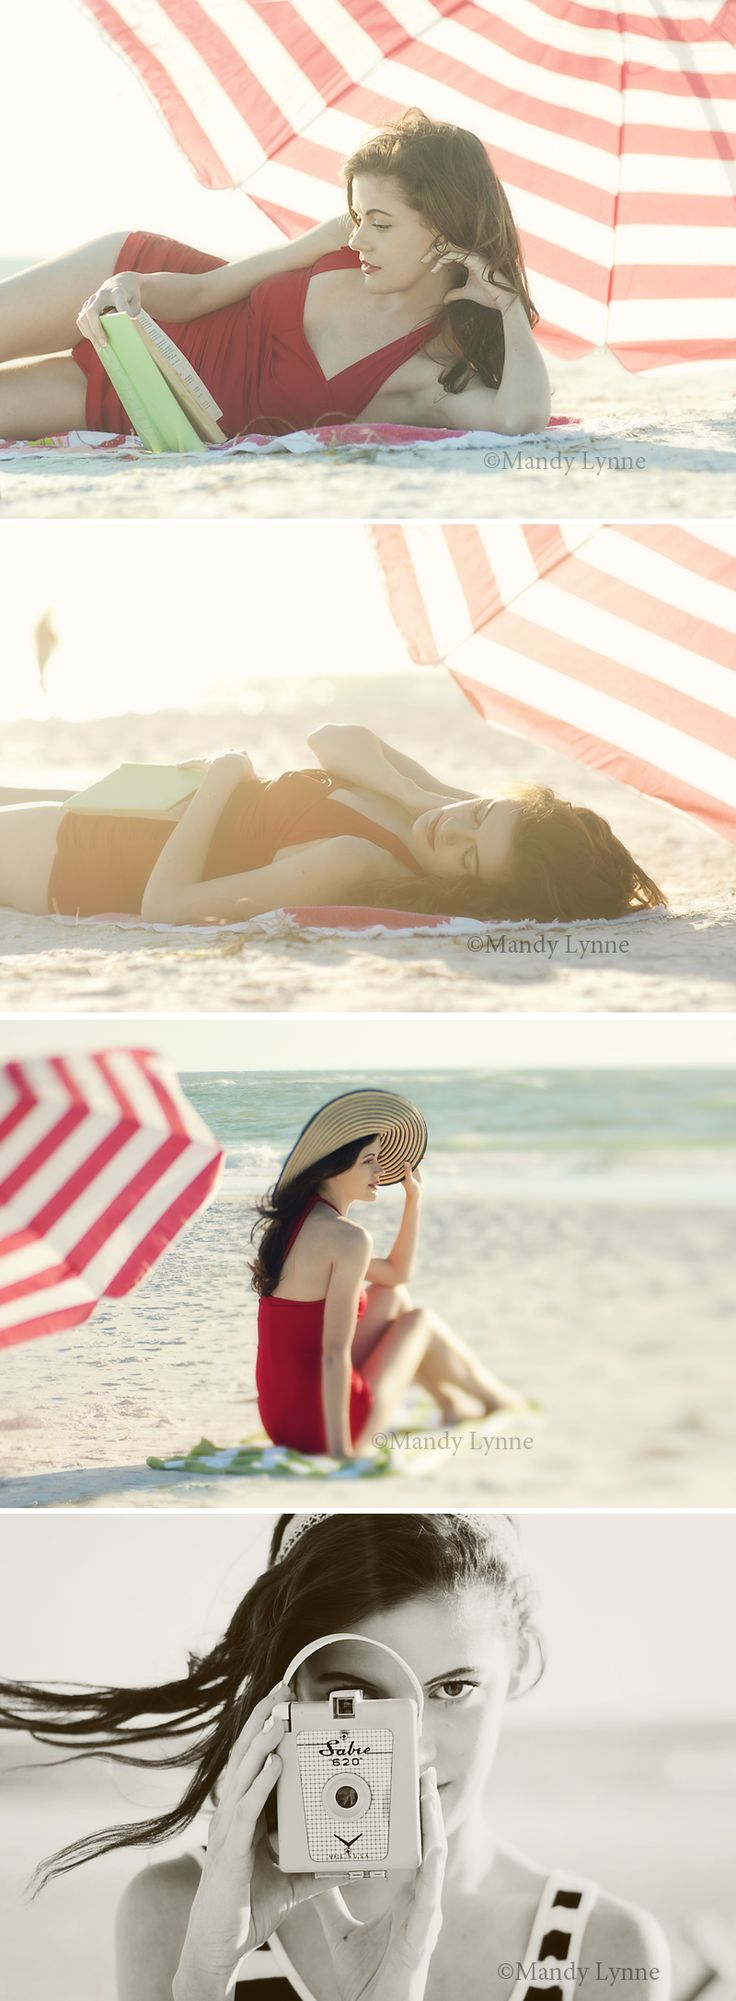 ©Mandy Lynne beach 1. Love her photography!